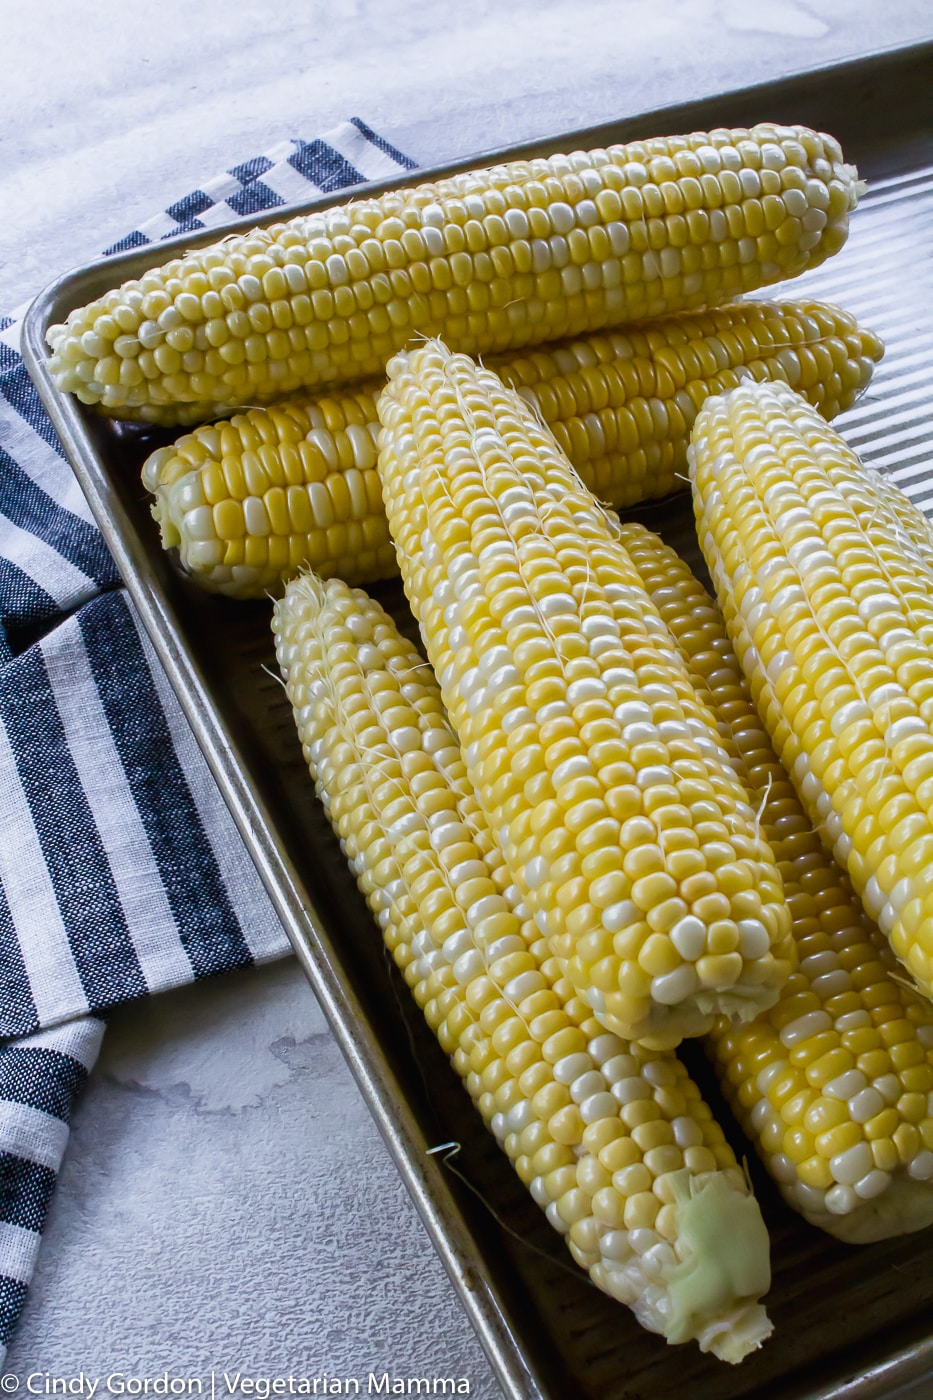 Sweet corn on a baking sheet